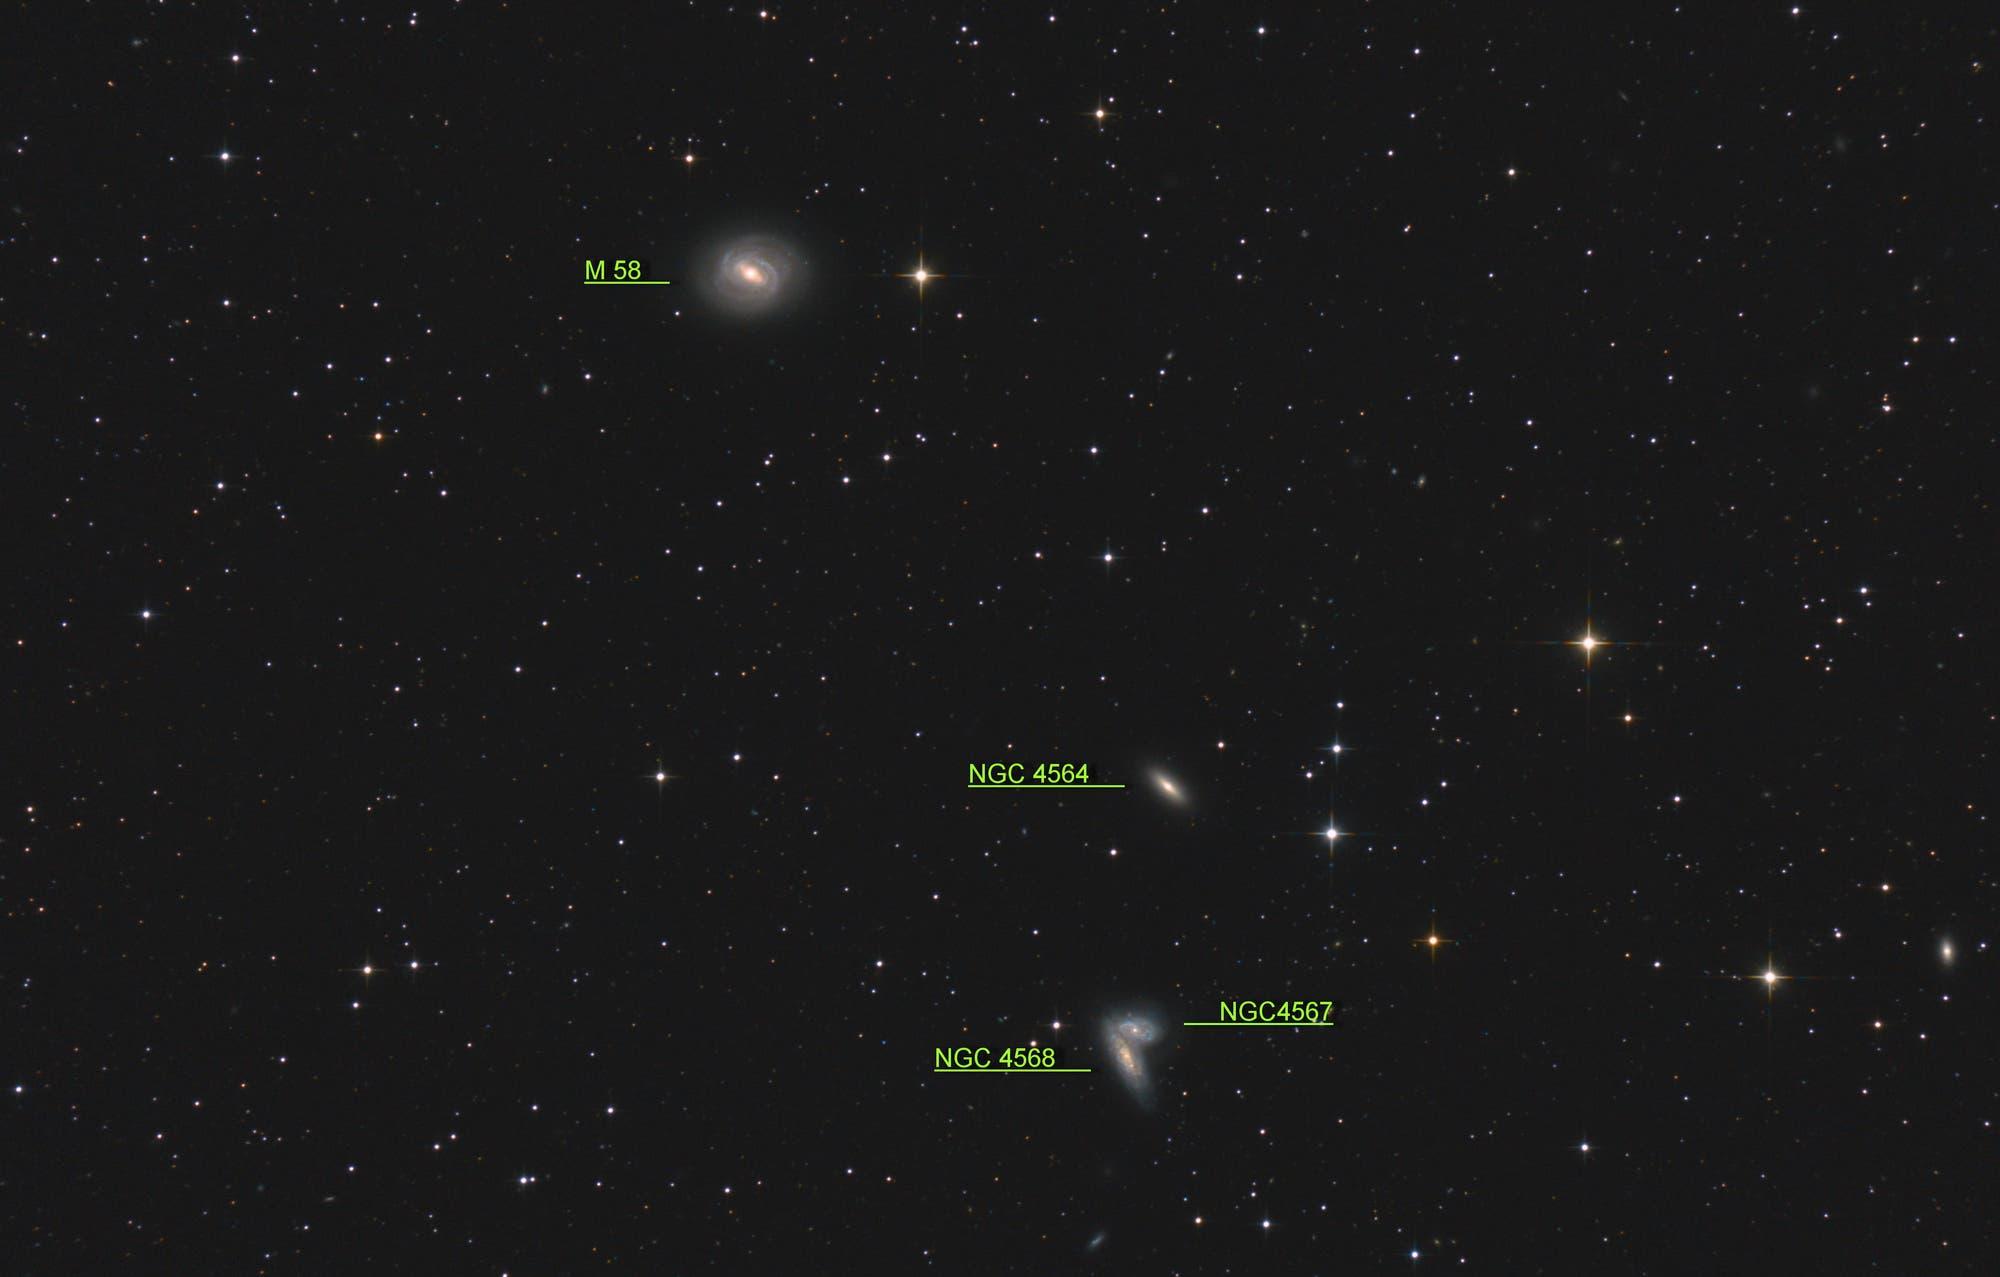 NGC 4567 / 4568, Siamesische Zwillinge (Objekte)